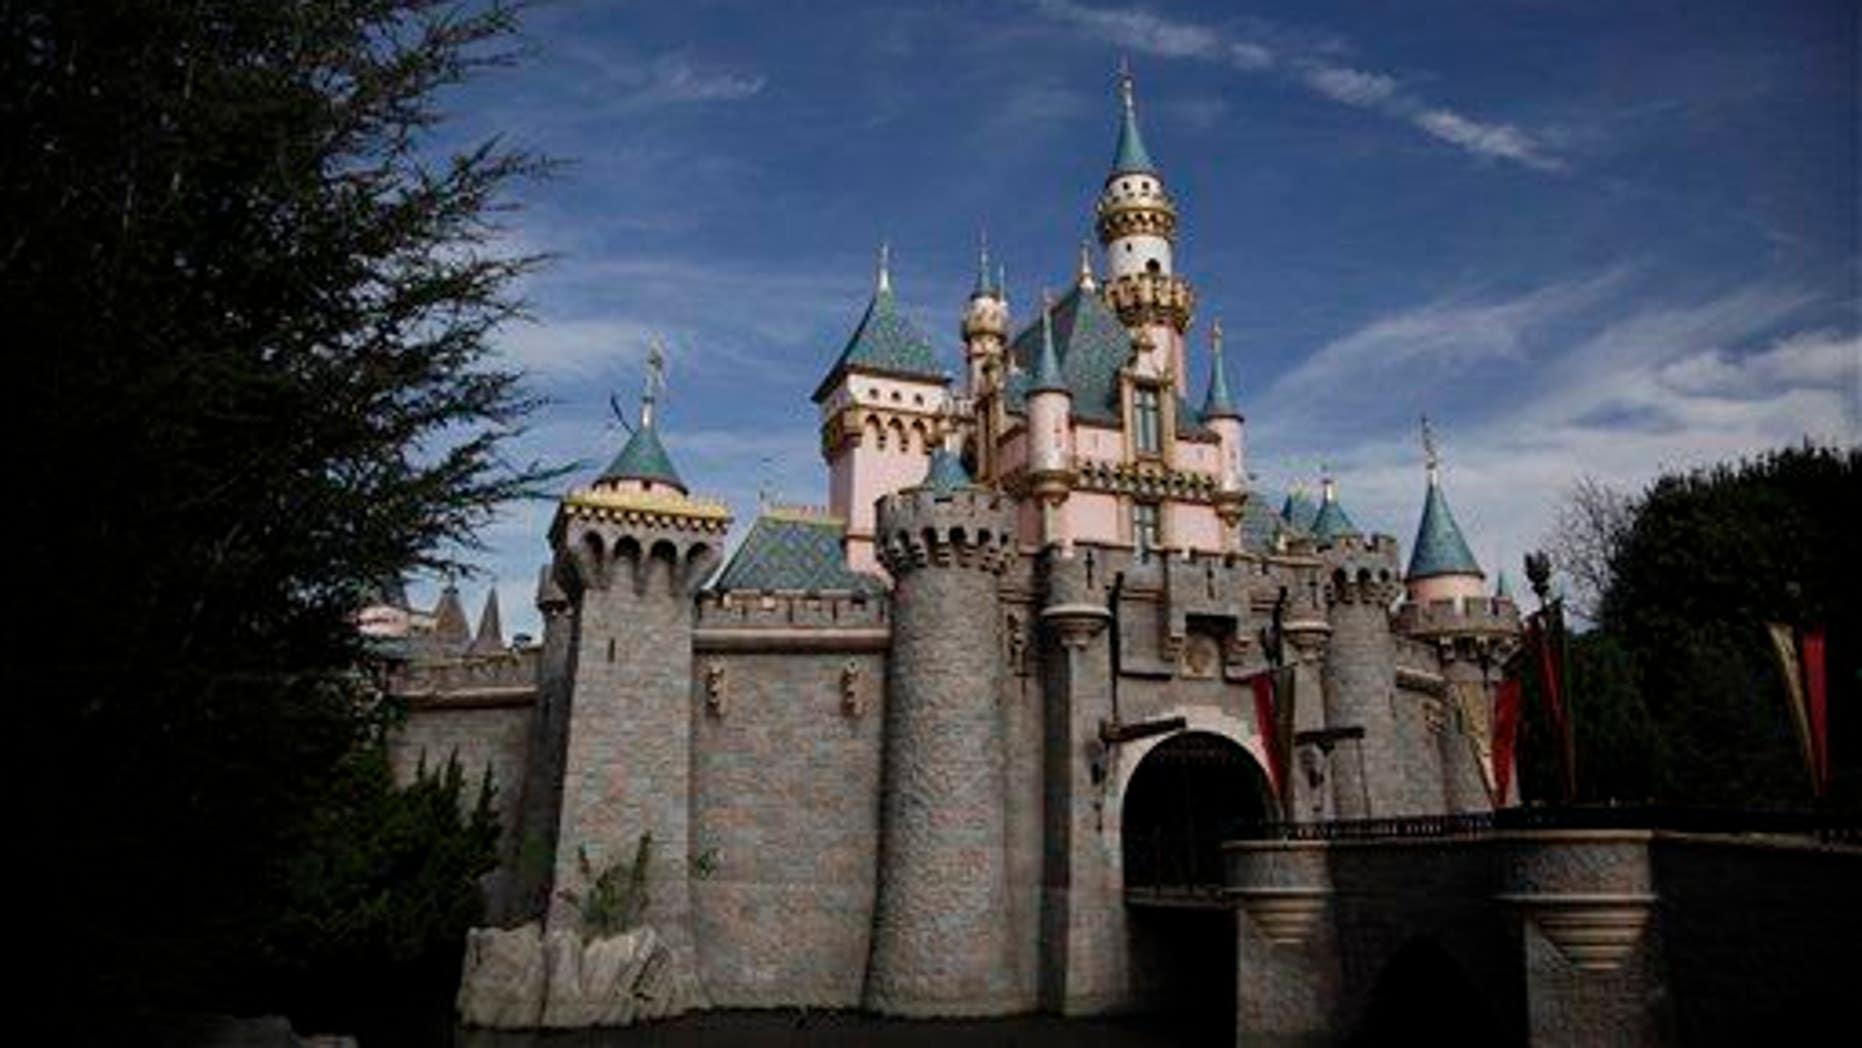 Sleeping Beauty's Castle is seen at Disneyland, in Anaheim, Calif.